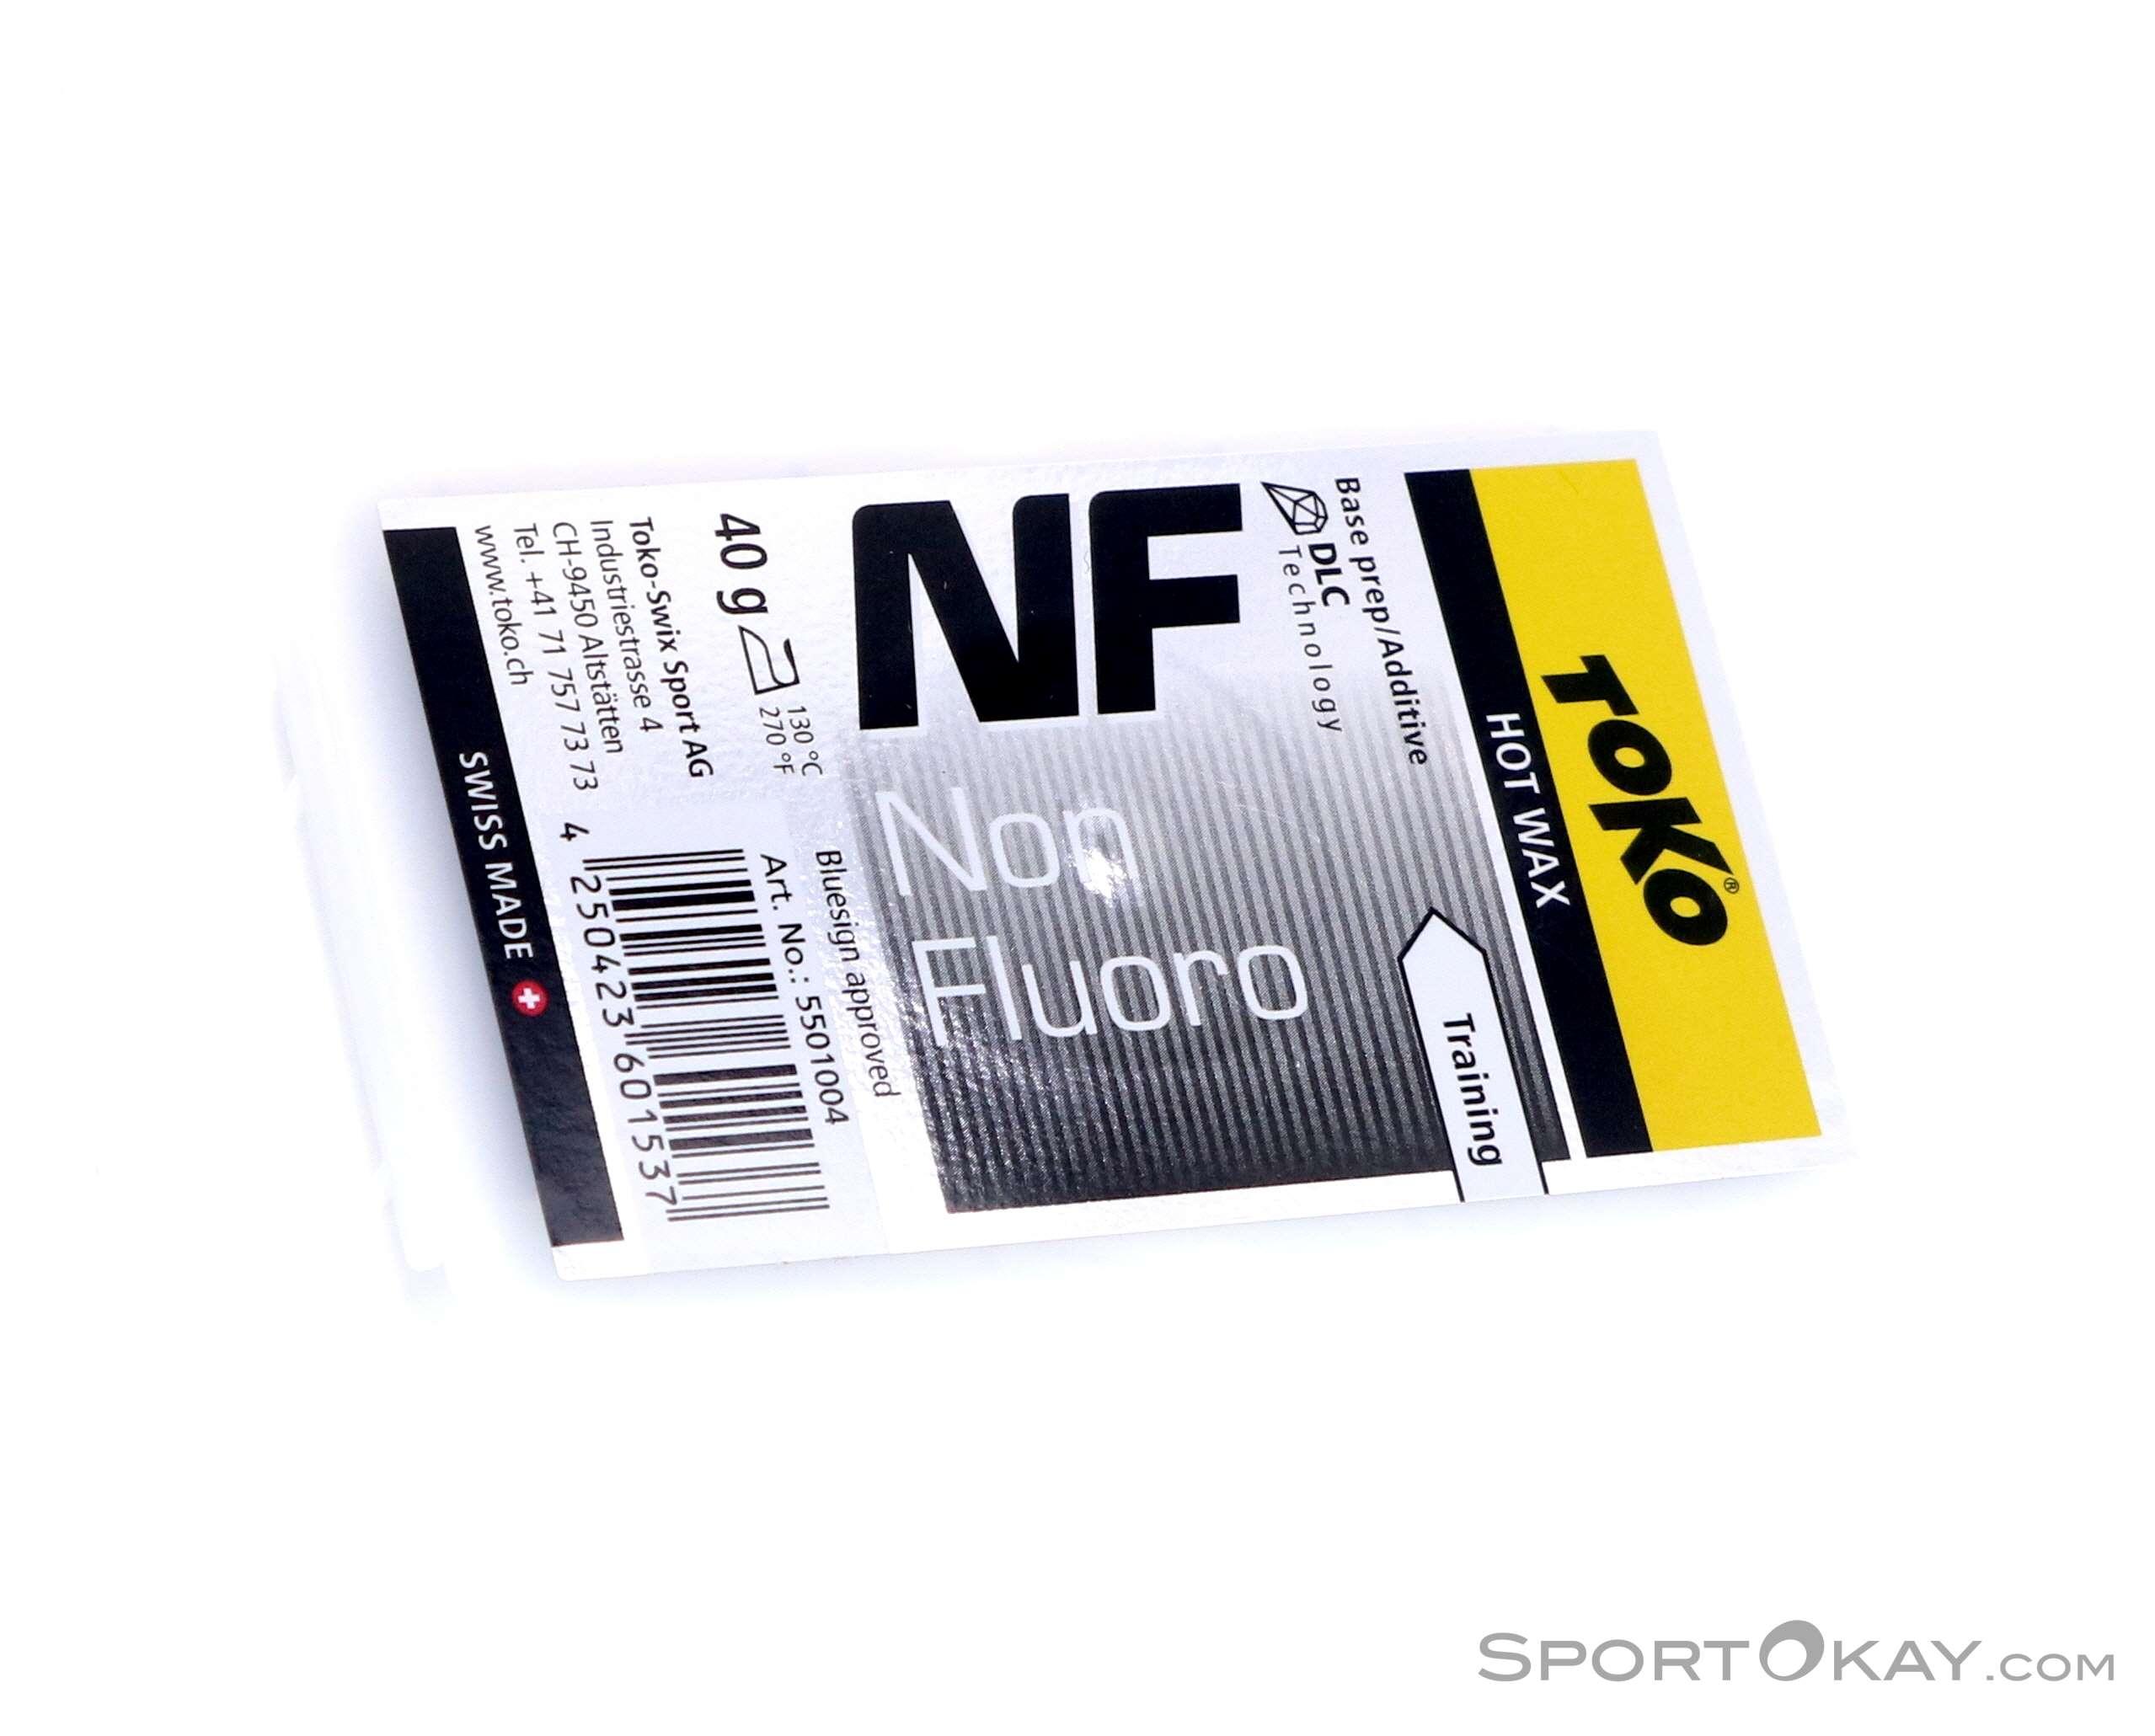 Toko NF Hot Wax black 40g Heisswachs-Schwarz-40